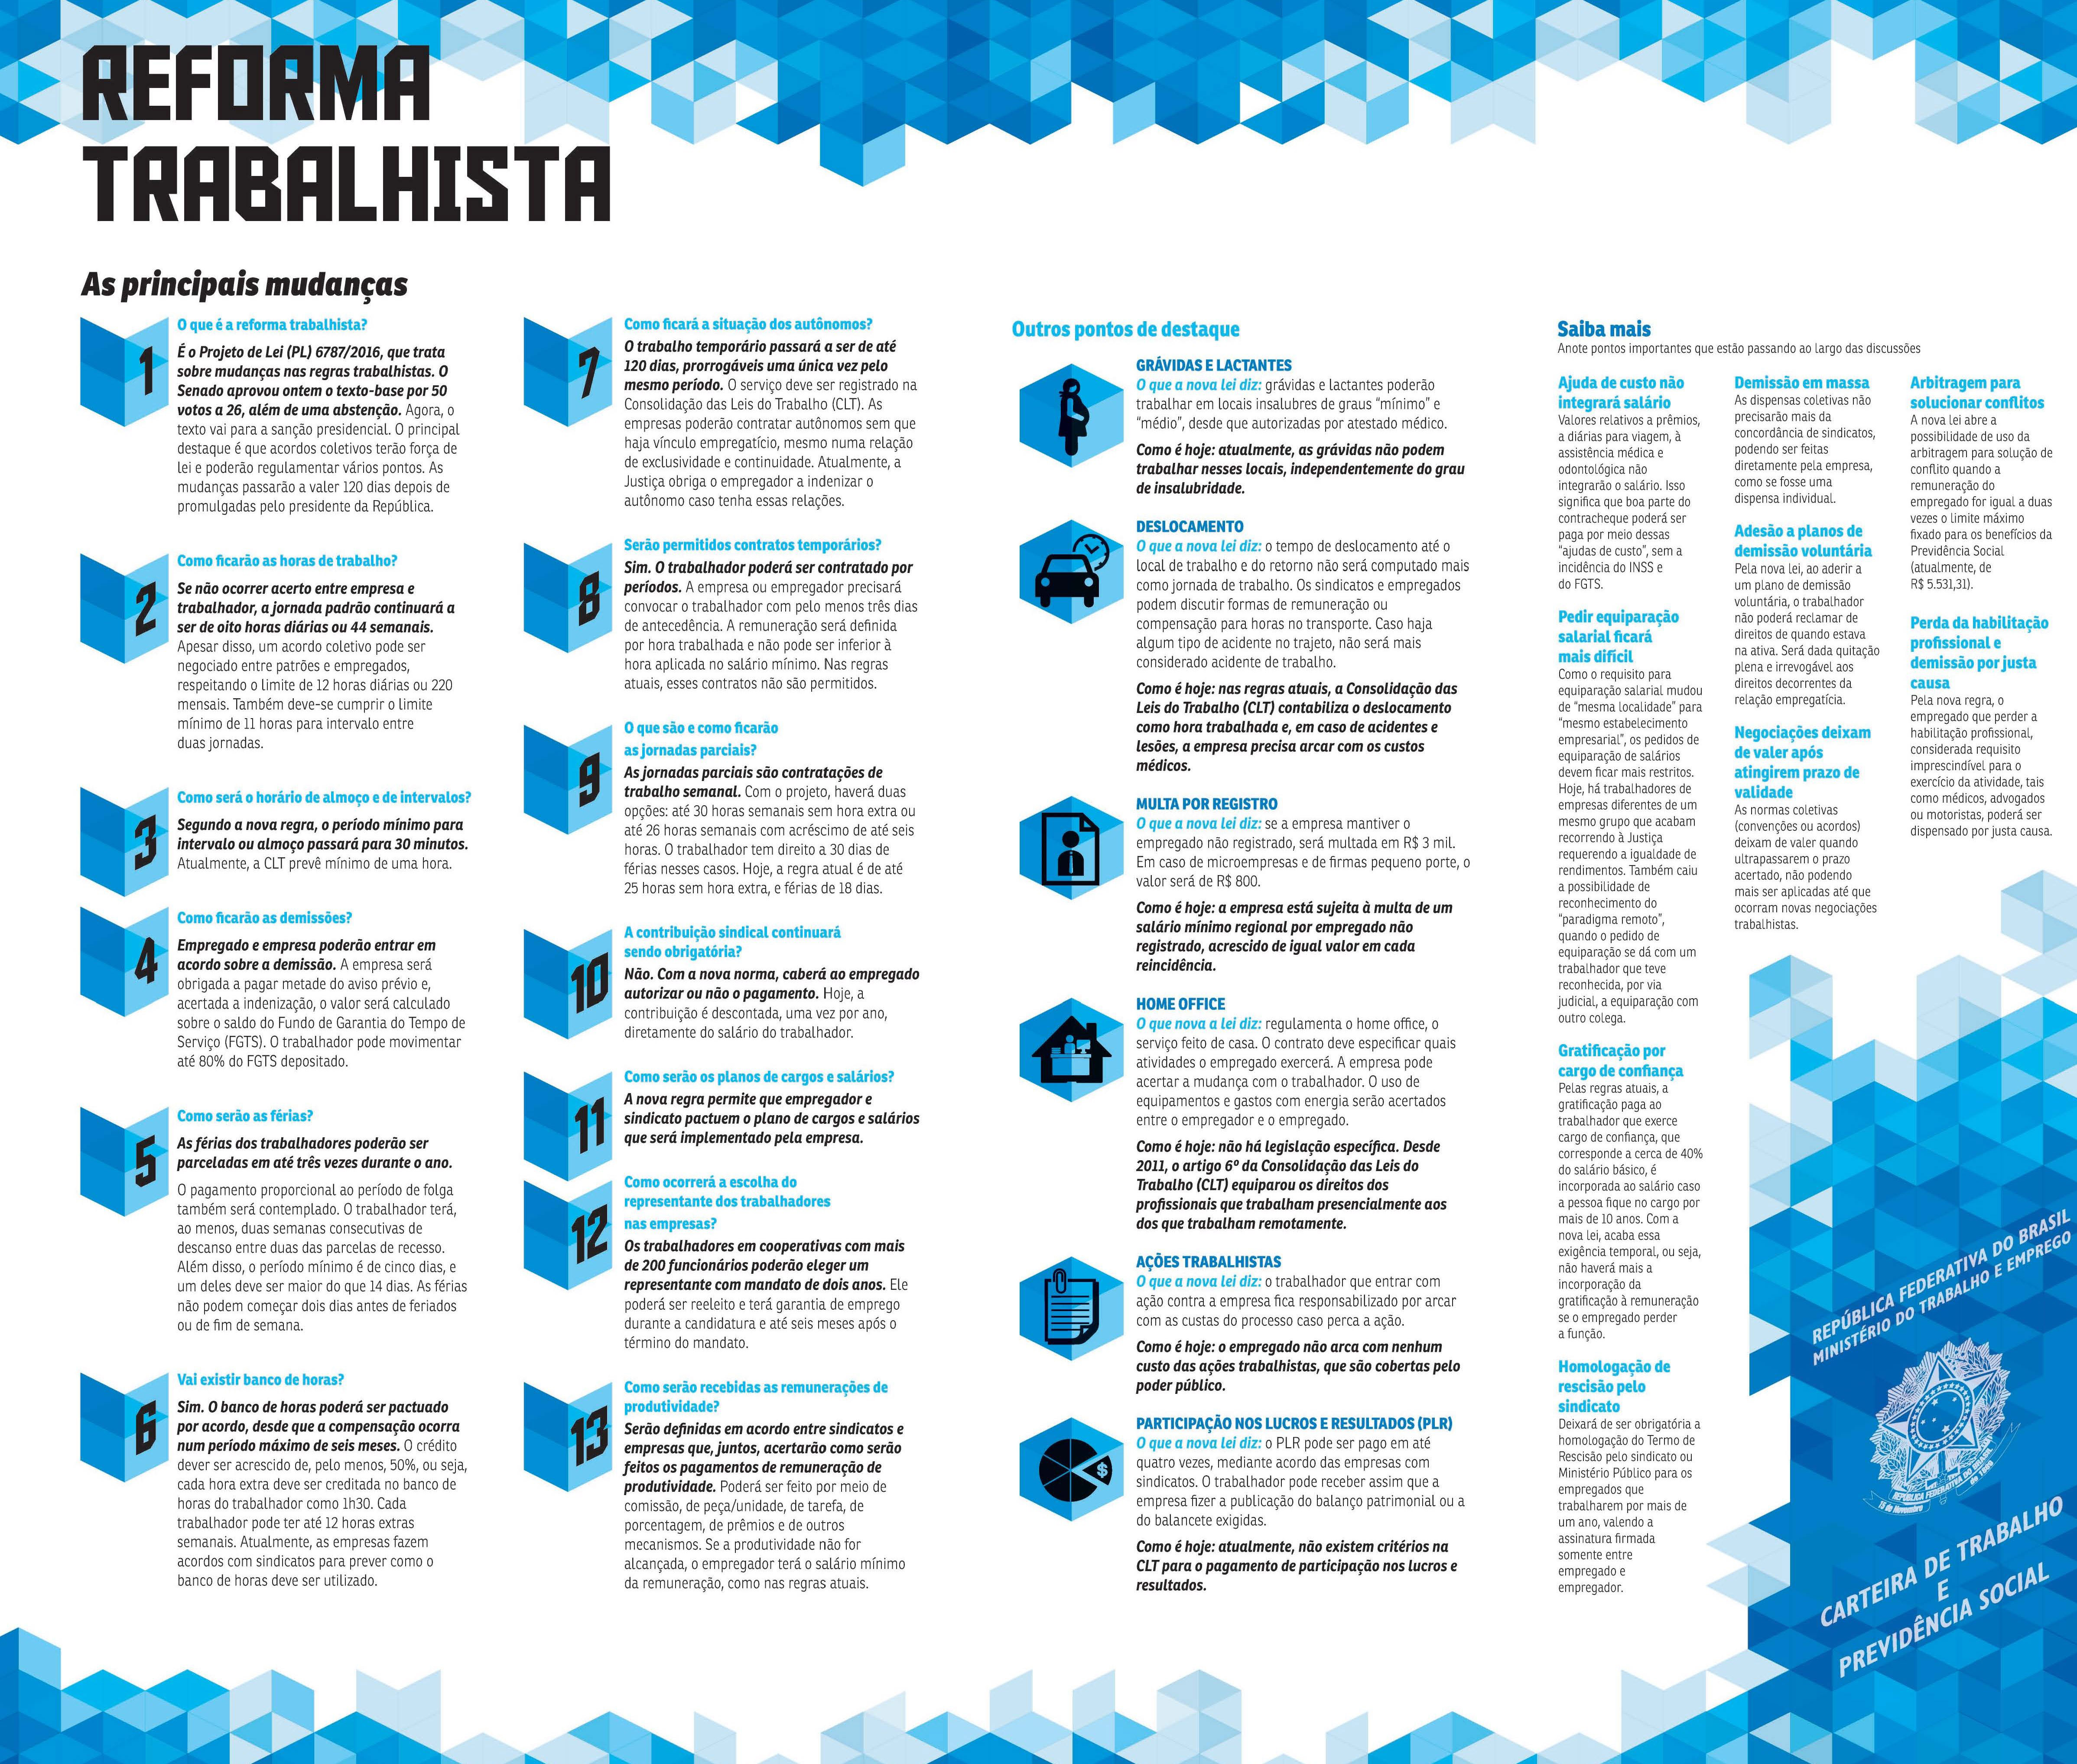 Alteracoes_reforma trabalhista_Correio Brasiliense